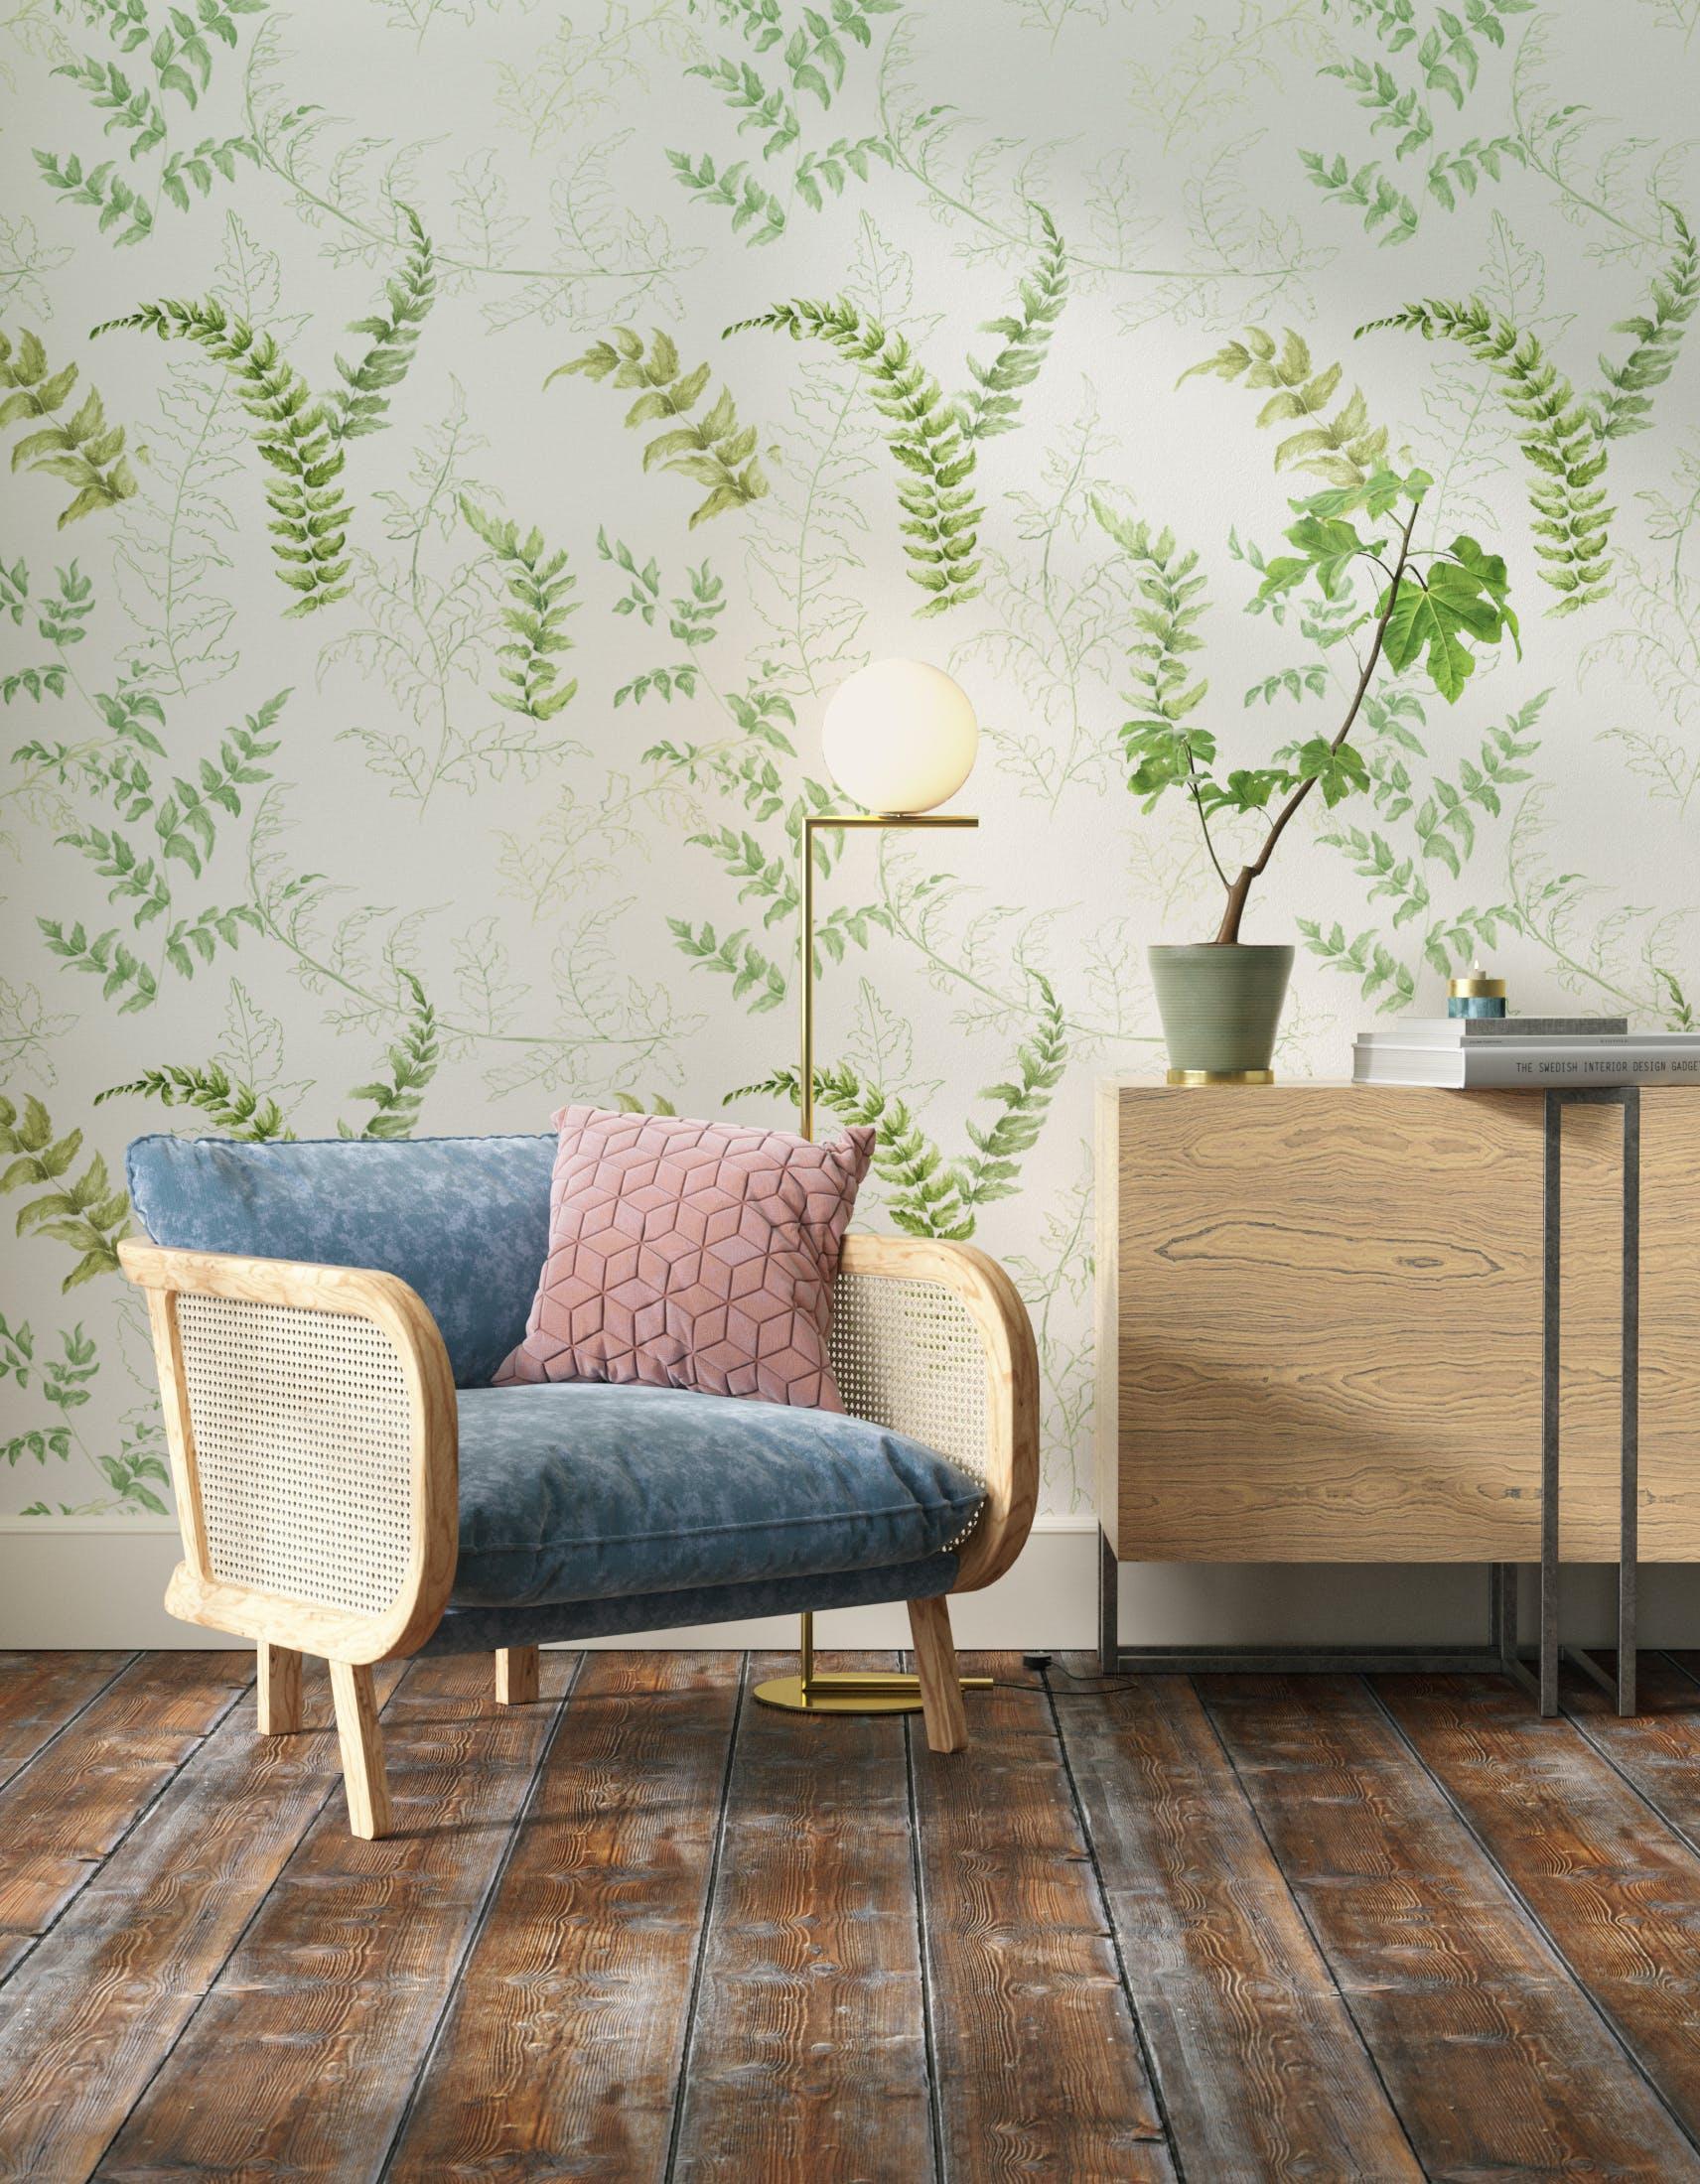 Living room decorated with Lick x Jenna Hewitt Fern 01 green botanical wallpaper